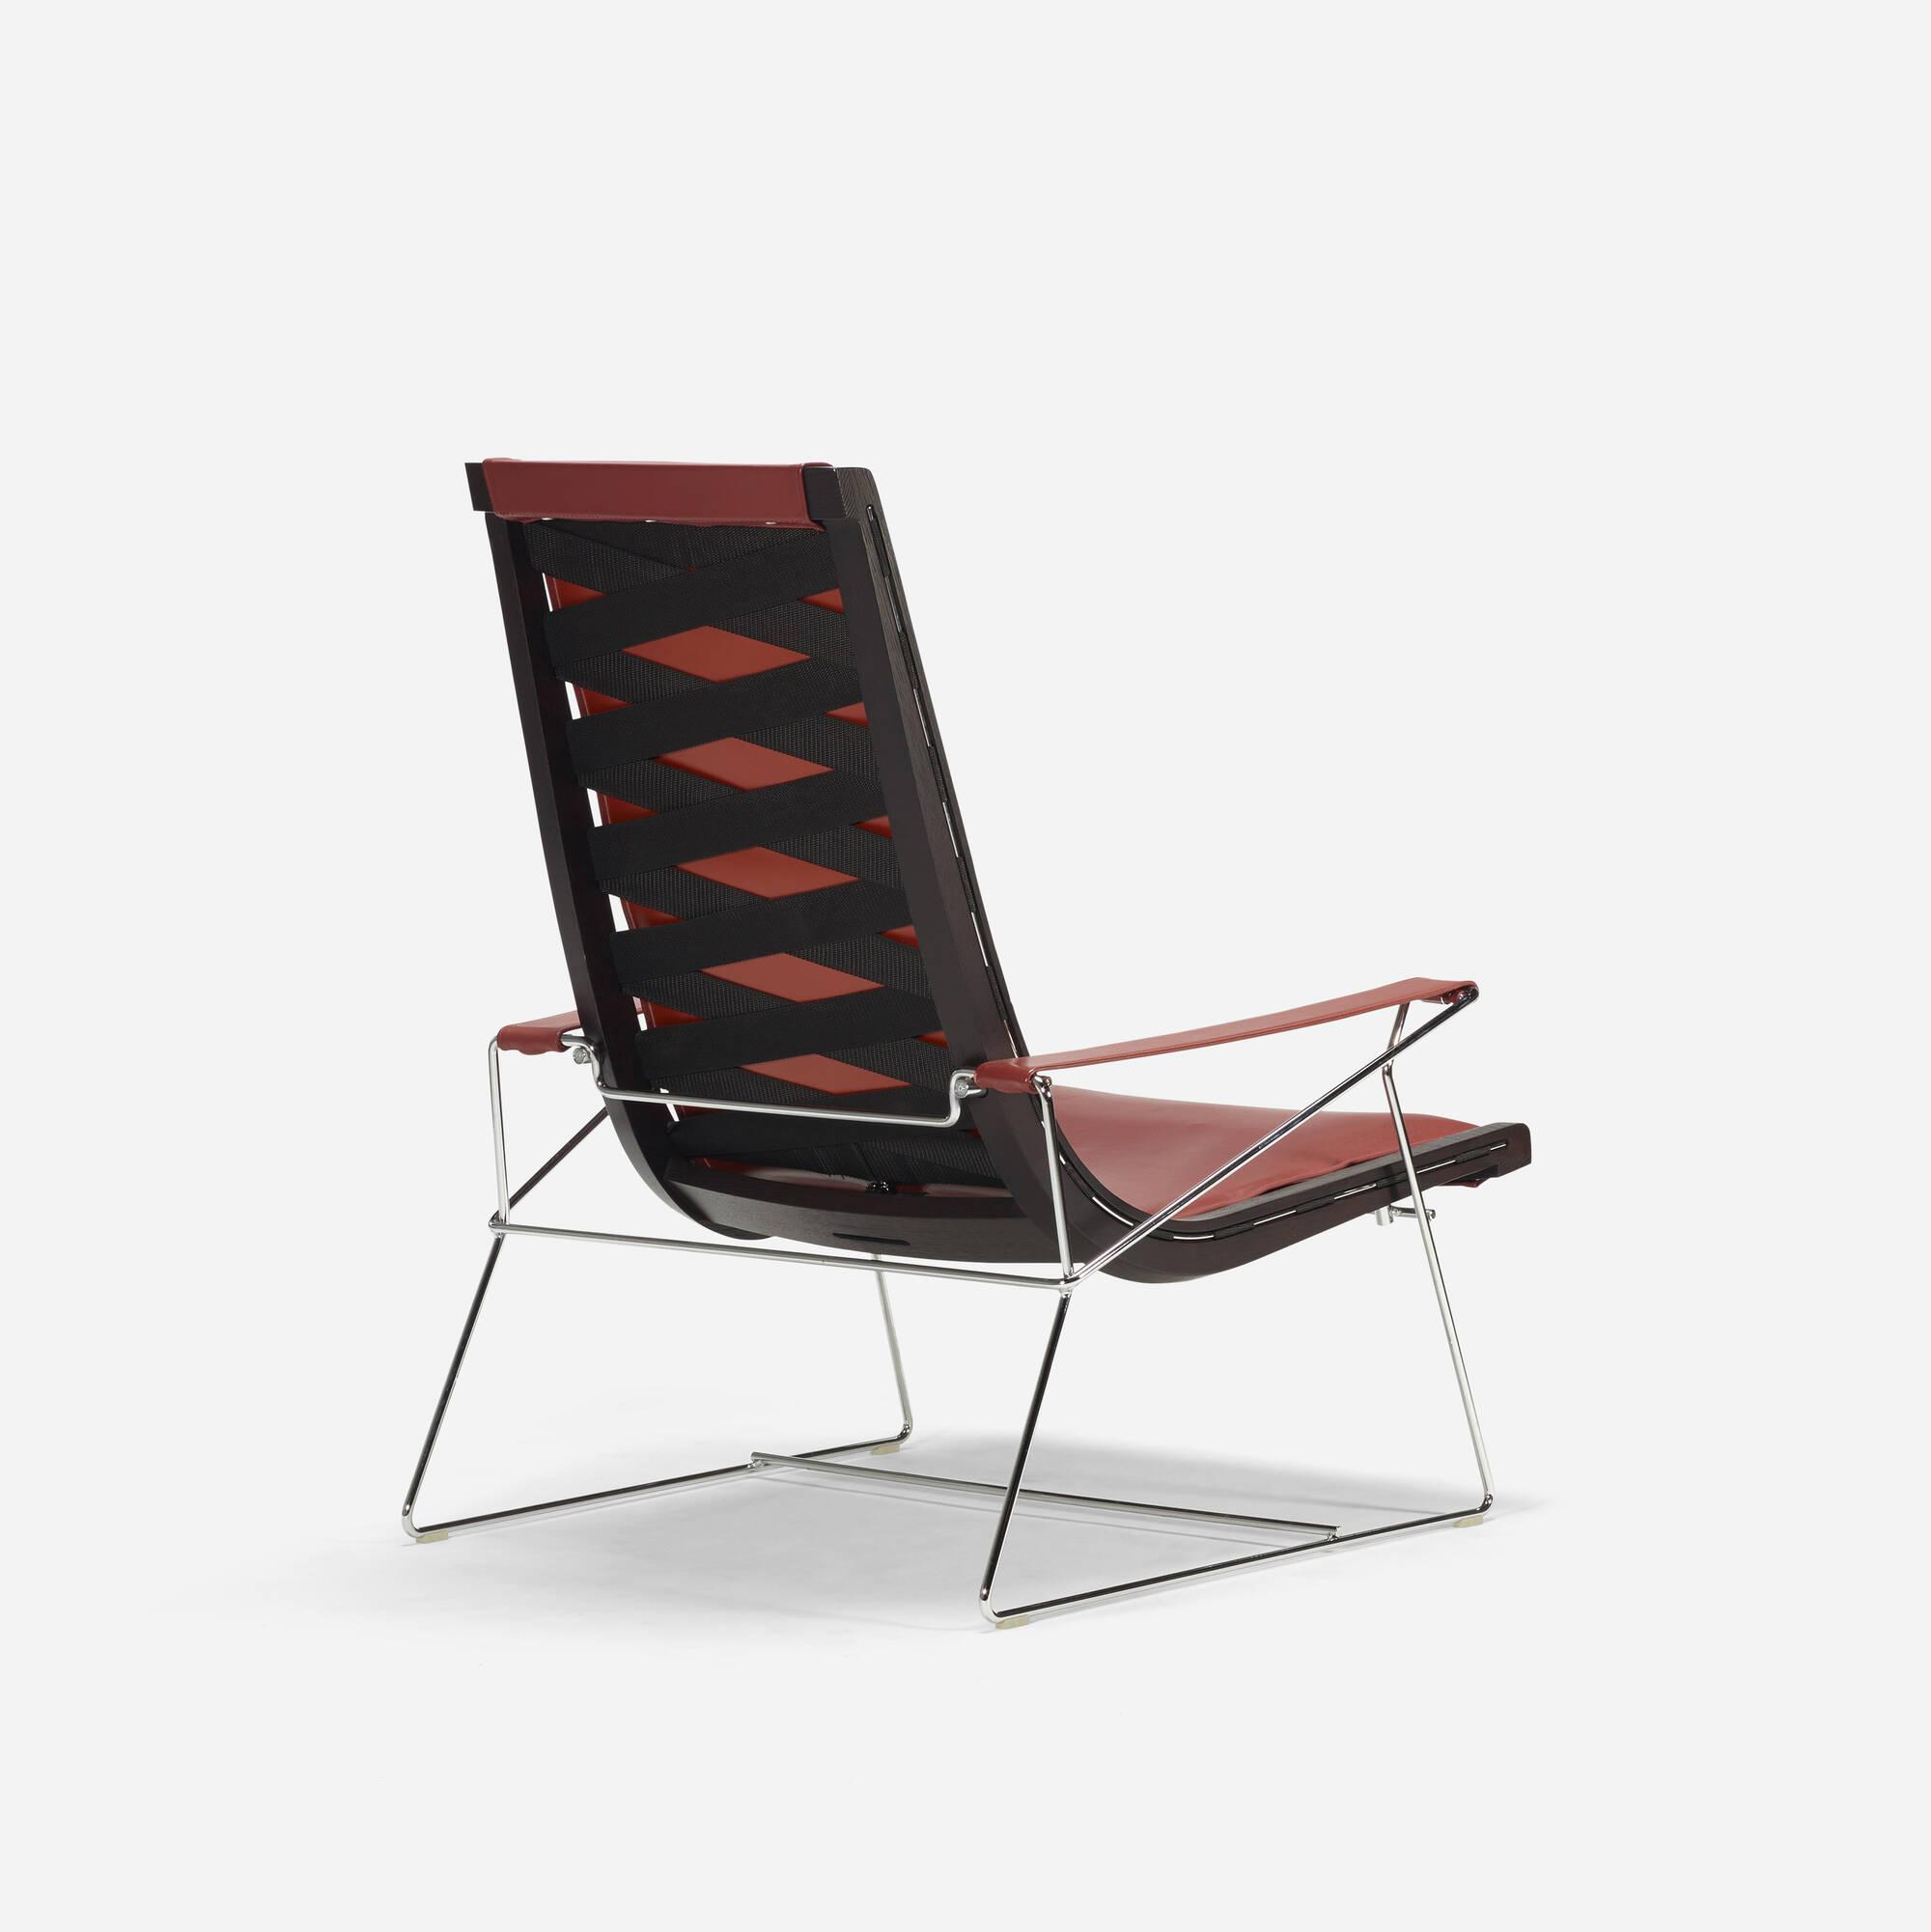 206: Antonio Citterio / J.J. armchair (2 of 3)